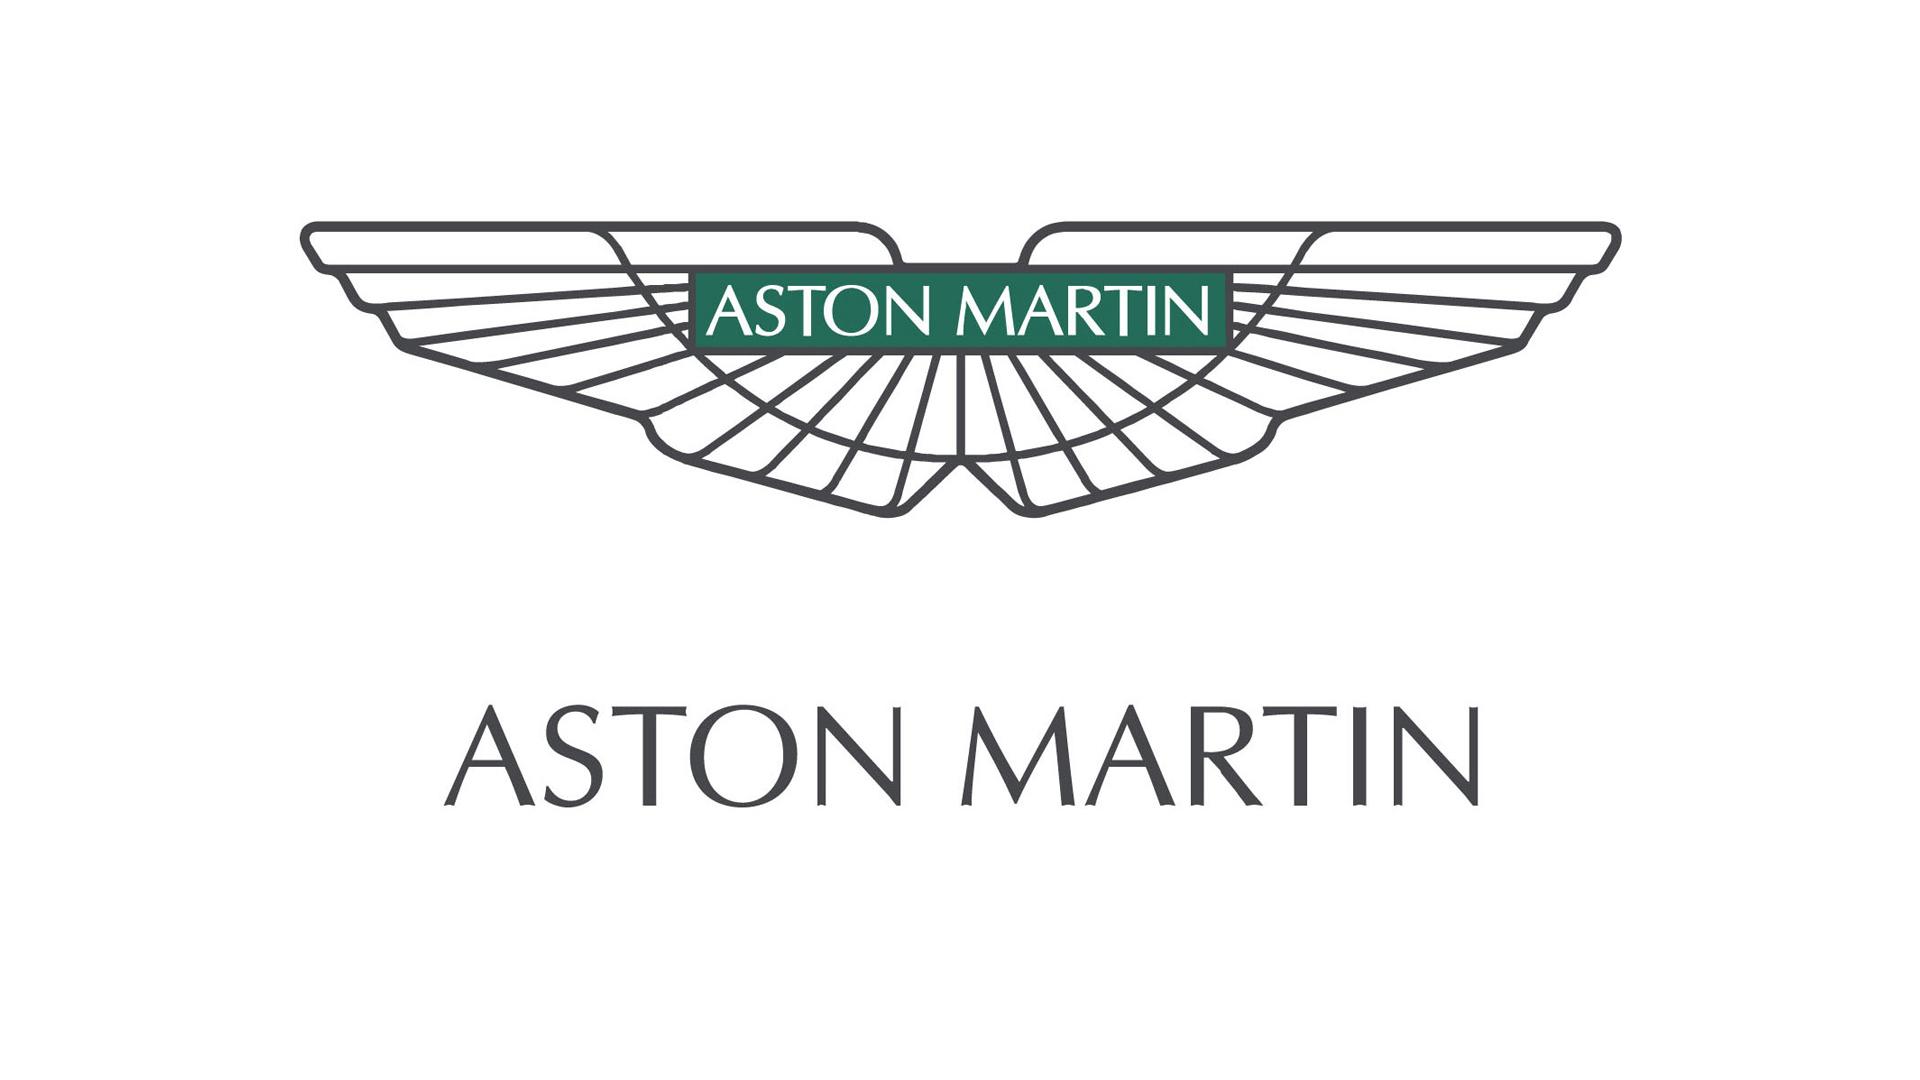 Aston Martin logo wallpapers HD